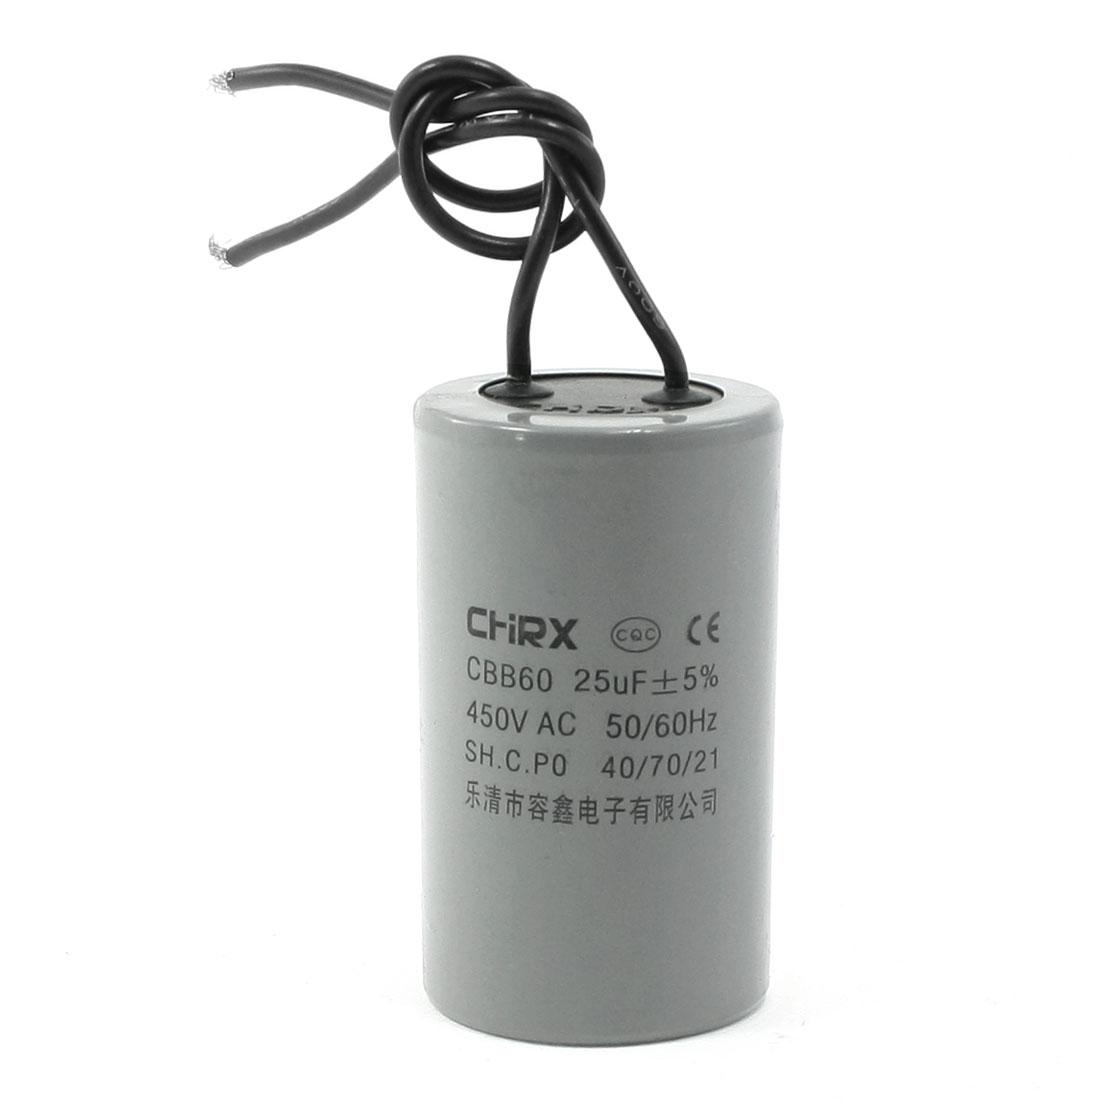 CBB60 AC 450V 25uF Polypropylene Film Motor Running Capacitor Gray